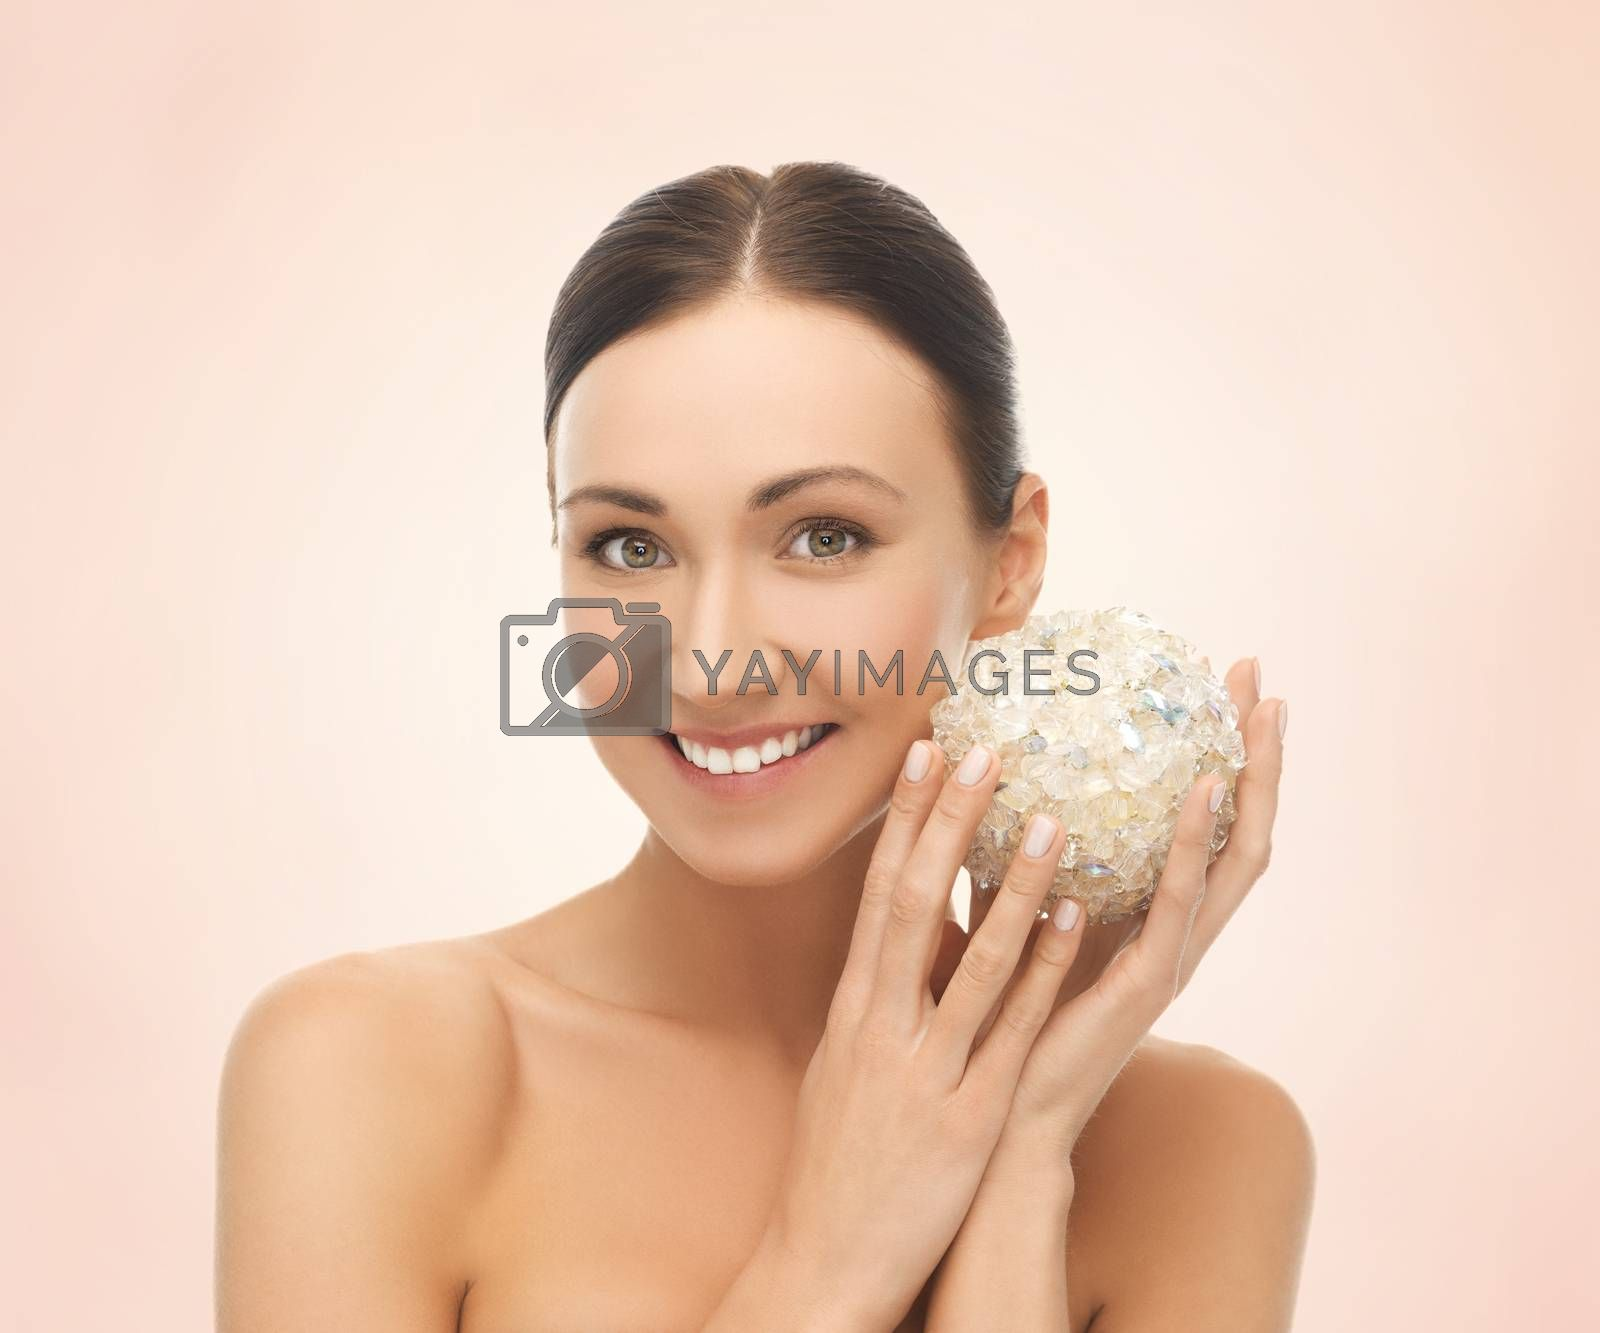 woman with salt ball for bathing by dolgachov